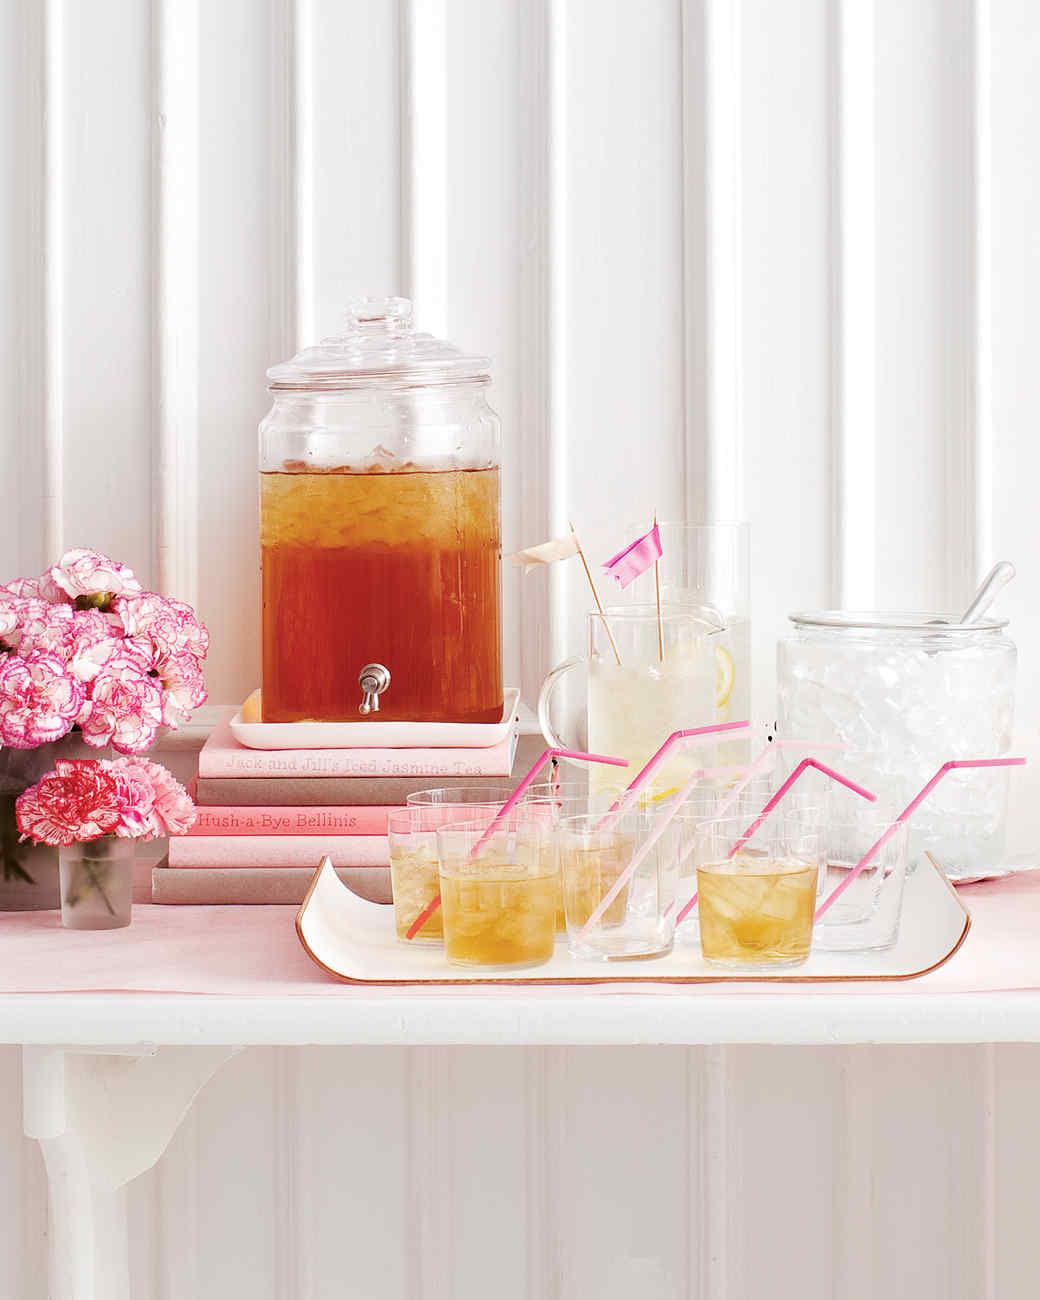 Jack and Jill's Iced Jasmine Tea